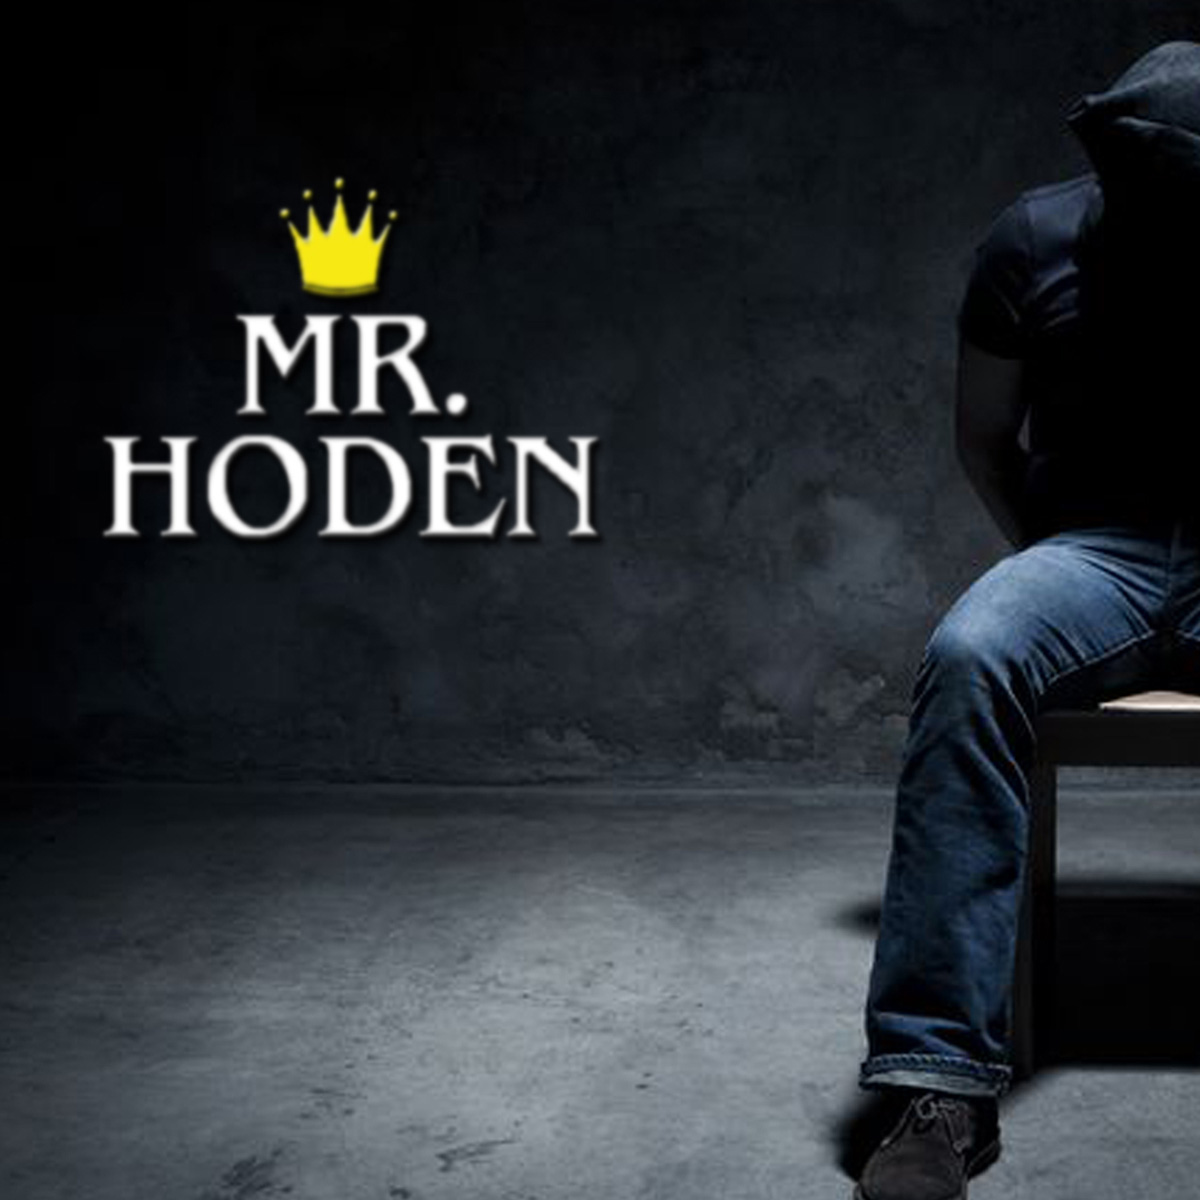 Upcoming: Mr. Hoden - Murderous Underground Rap Beat 2019 [FREE BEAT]